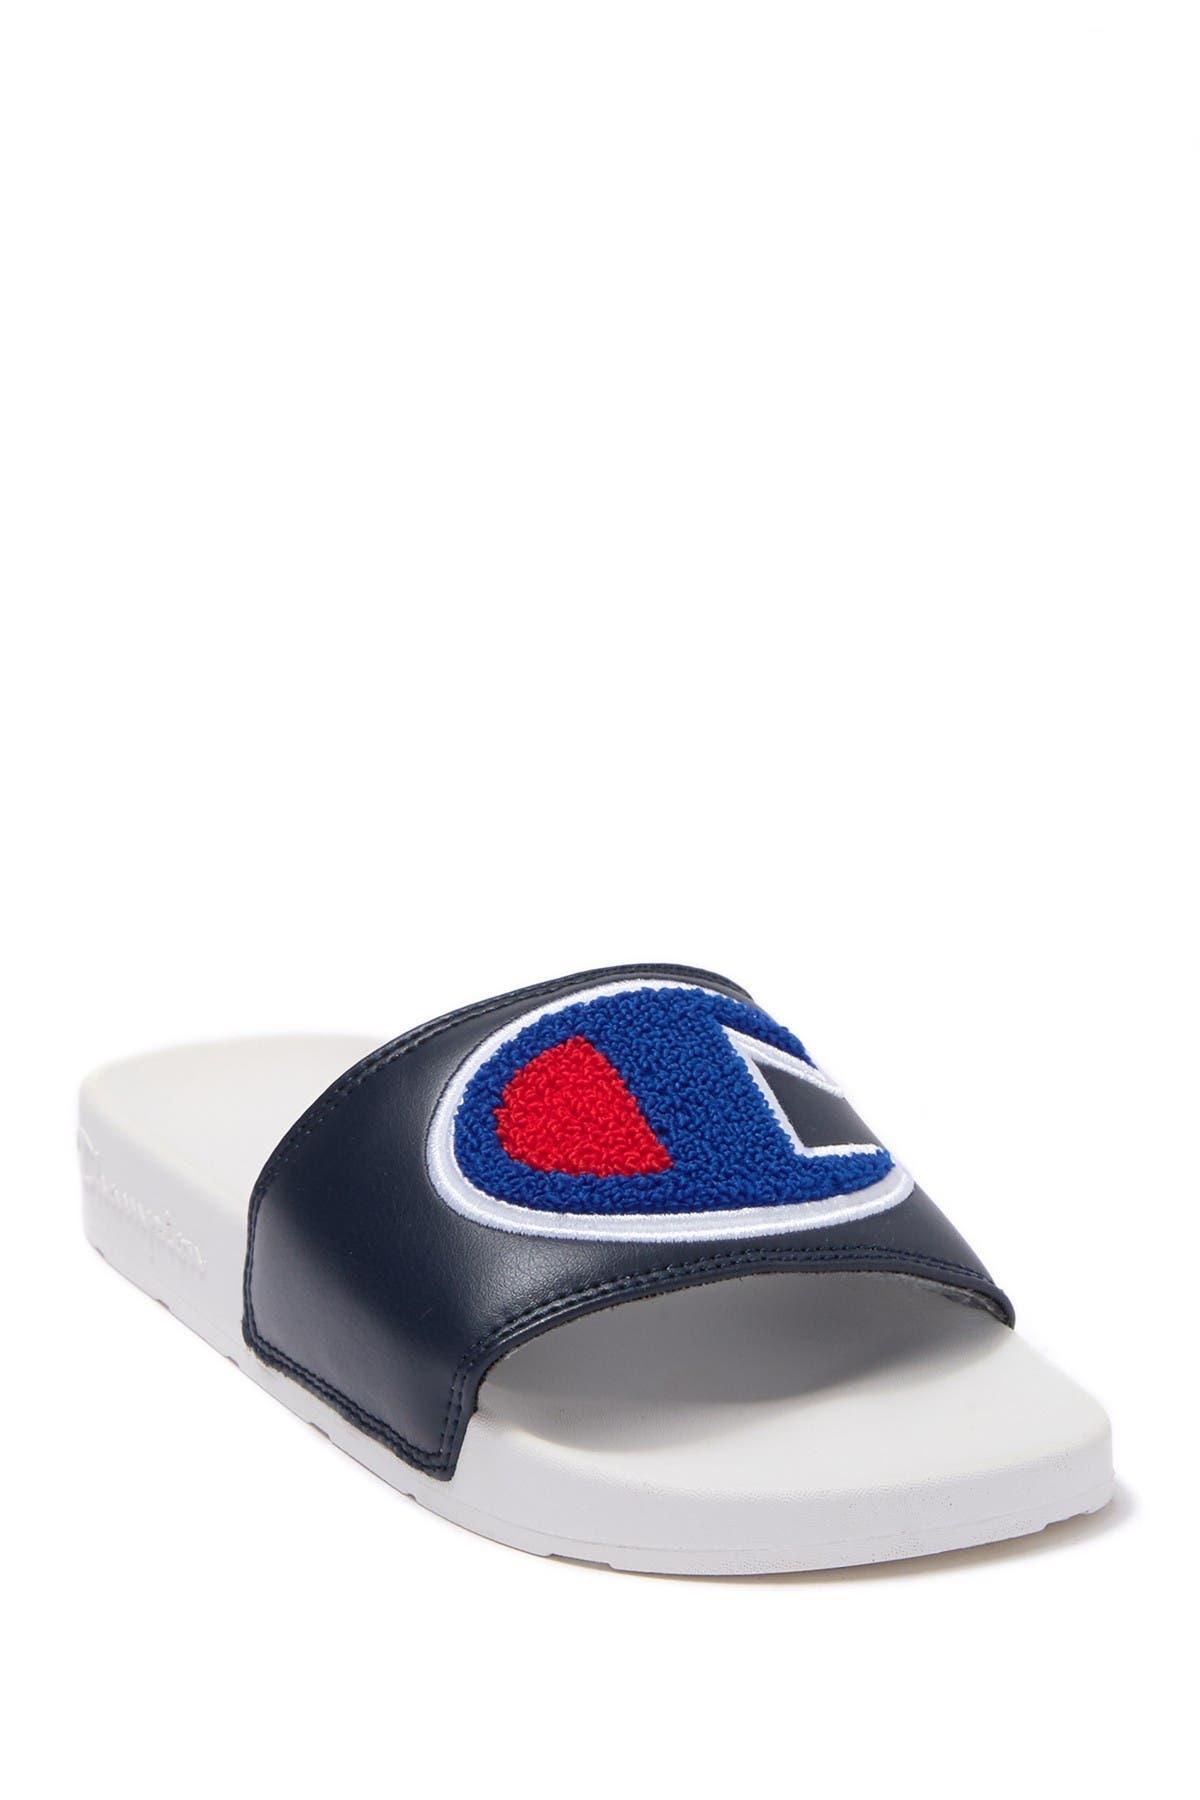 Image of Champion IPO Chenille Slide Sandal